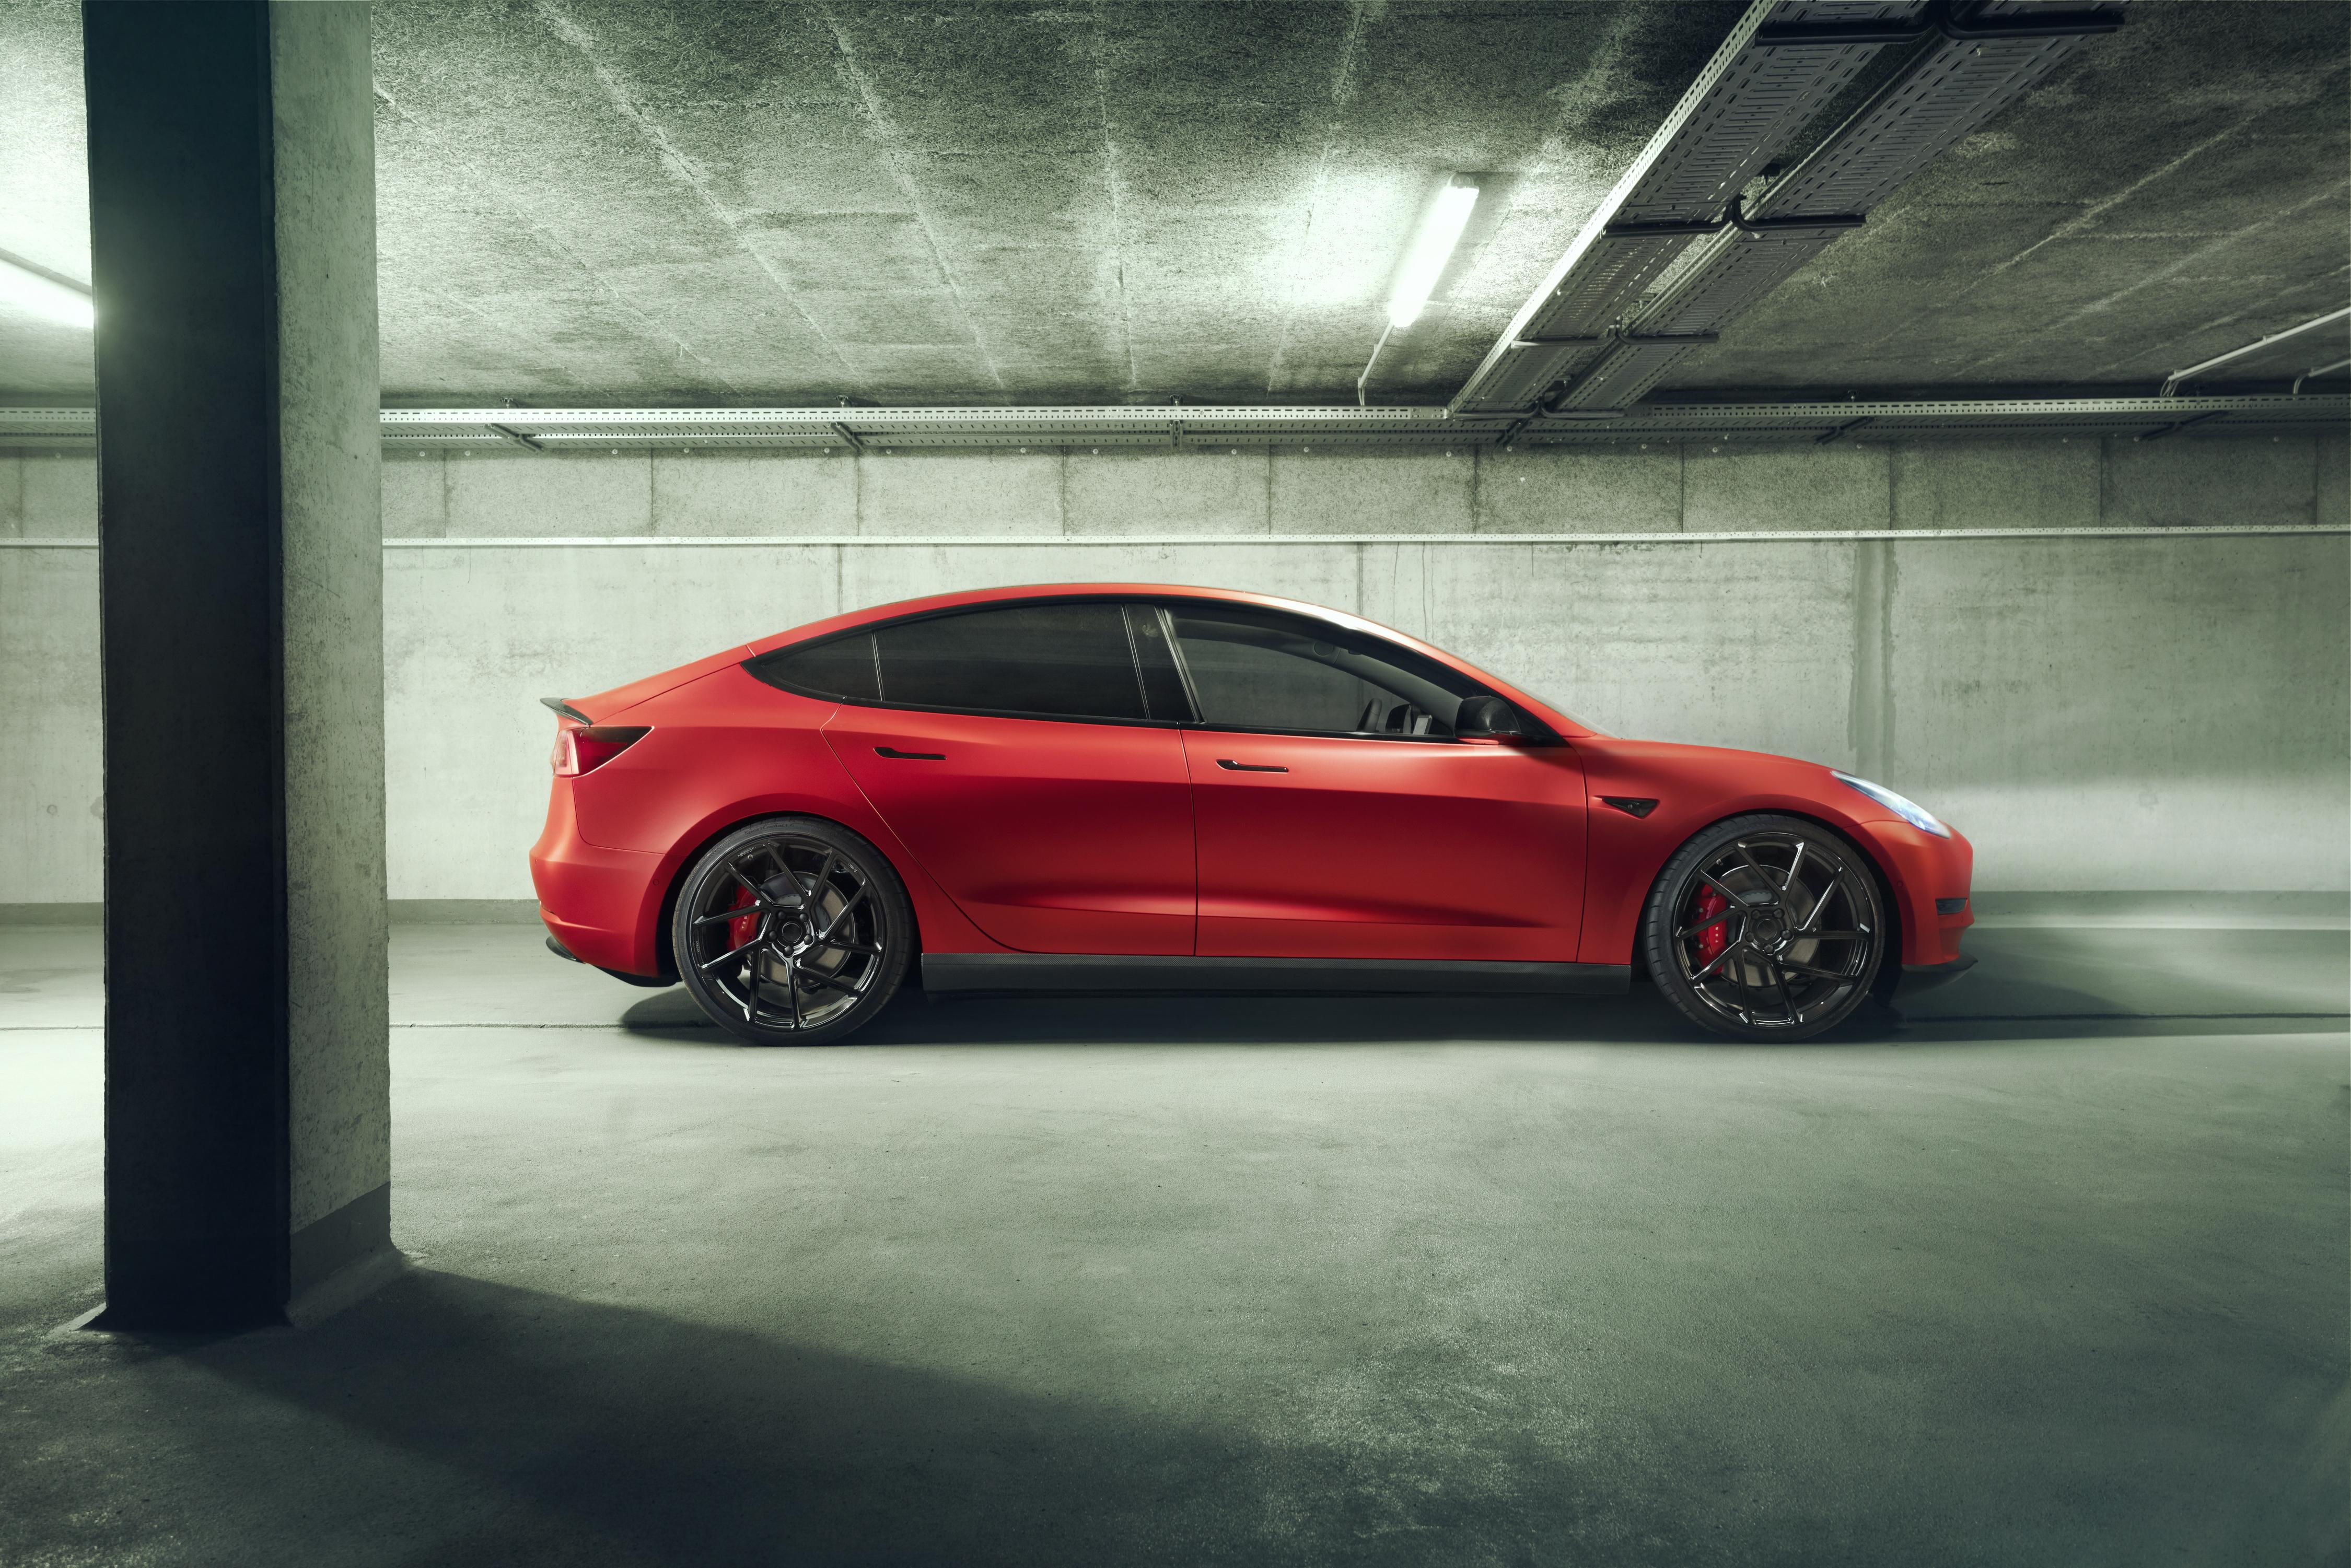 5k Novitec Tesla Model 3 2019 Hd Cars 4k Wallpapers